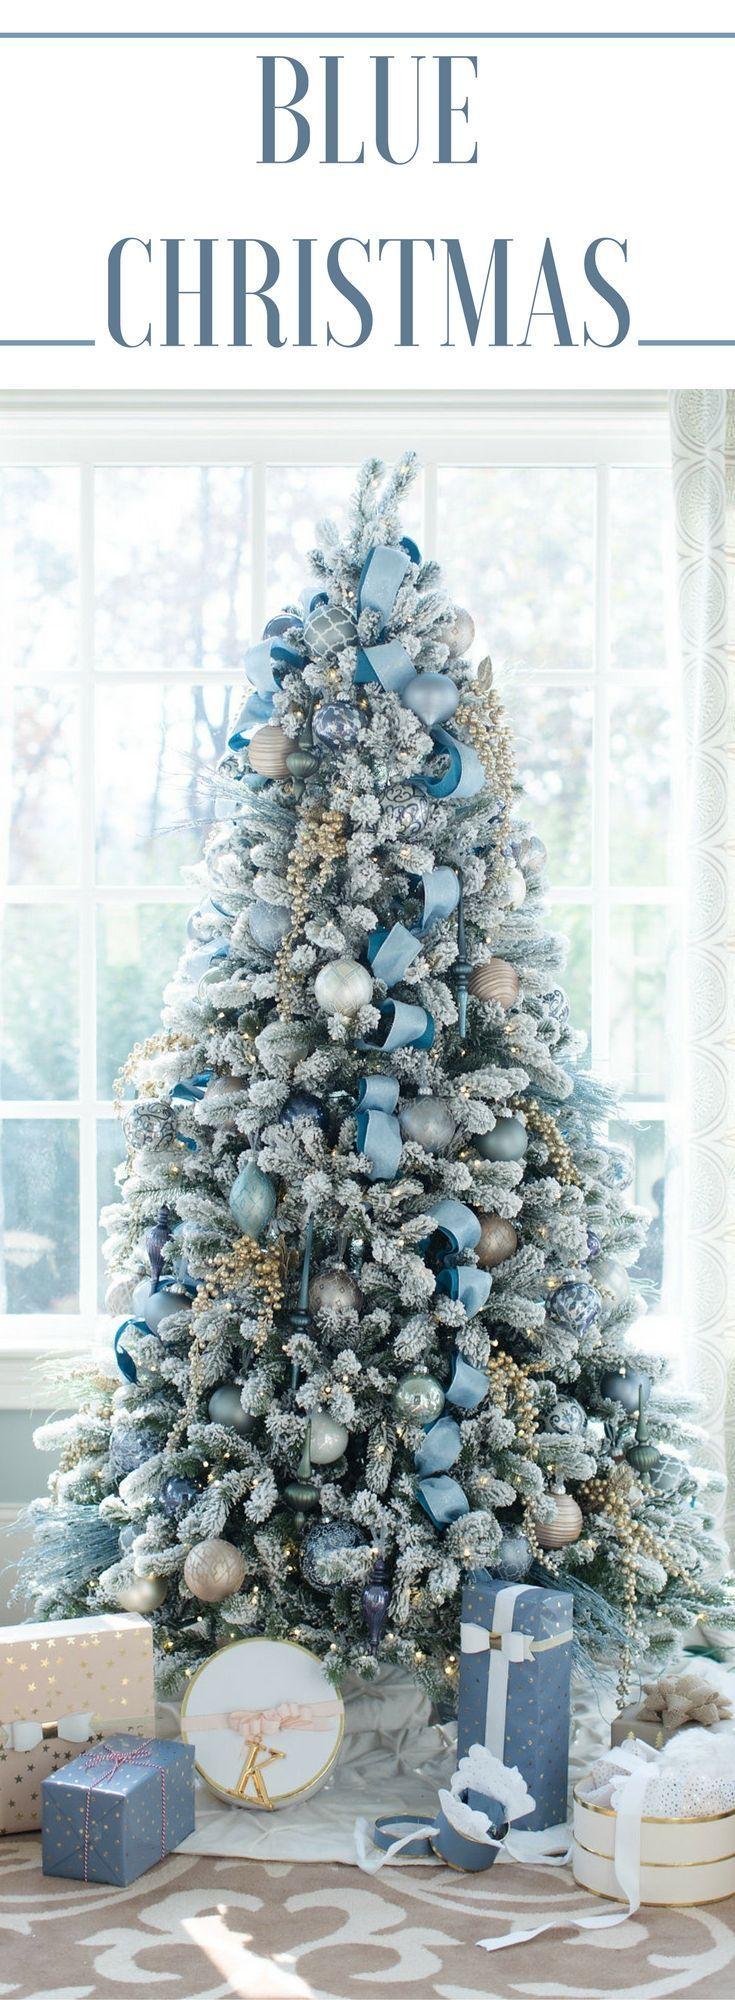 Blue Christmas Decor Theme 291 best Christmas